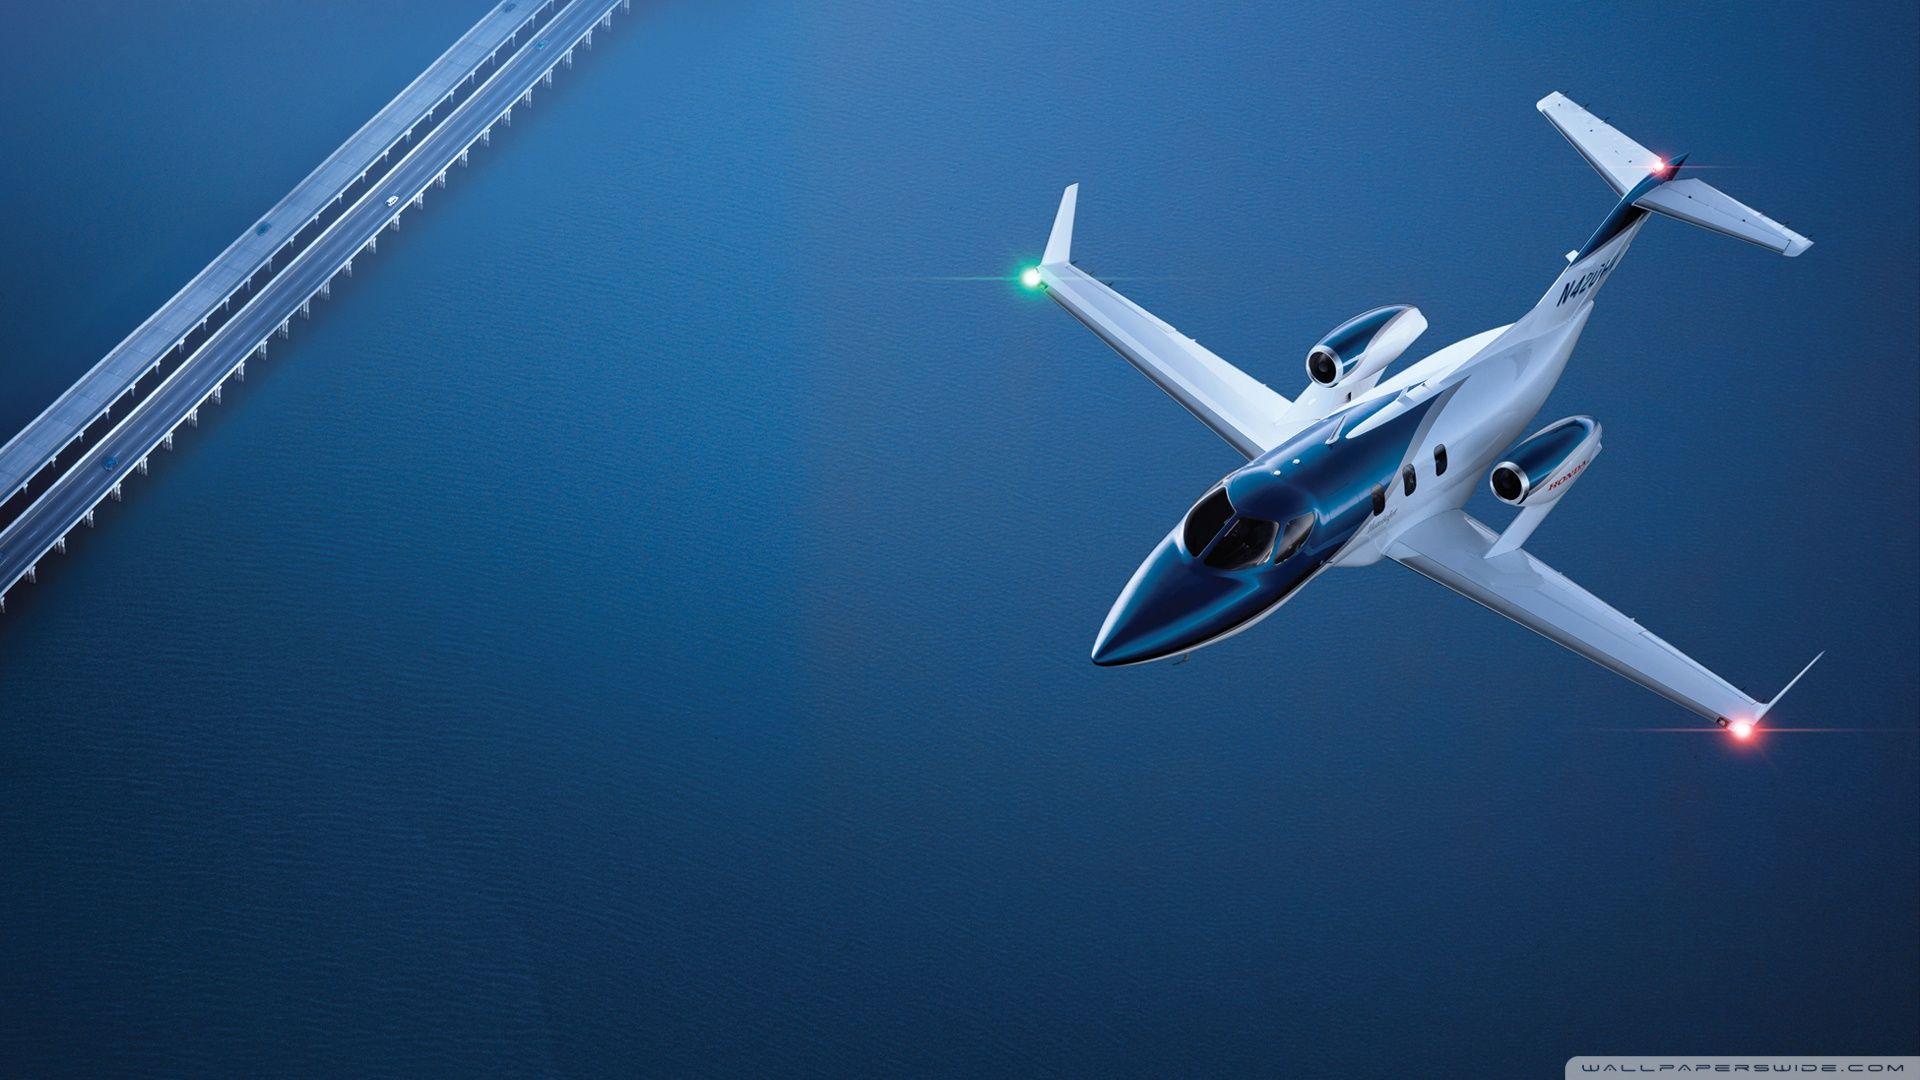 Image For Private Jet Flight Attendant Jobs Wallpaper Desktop HD